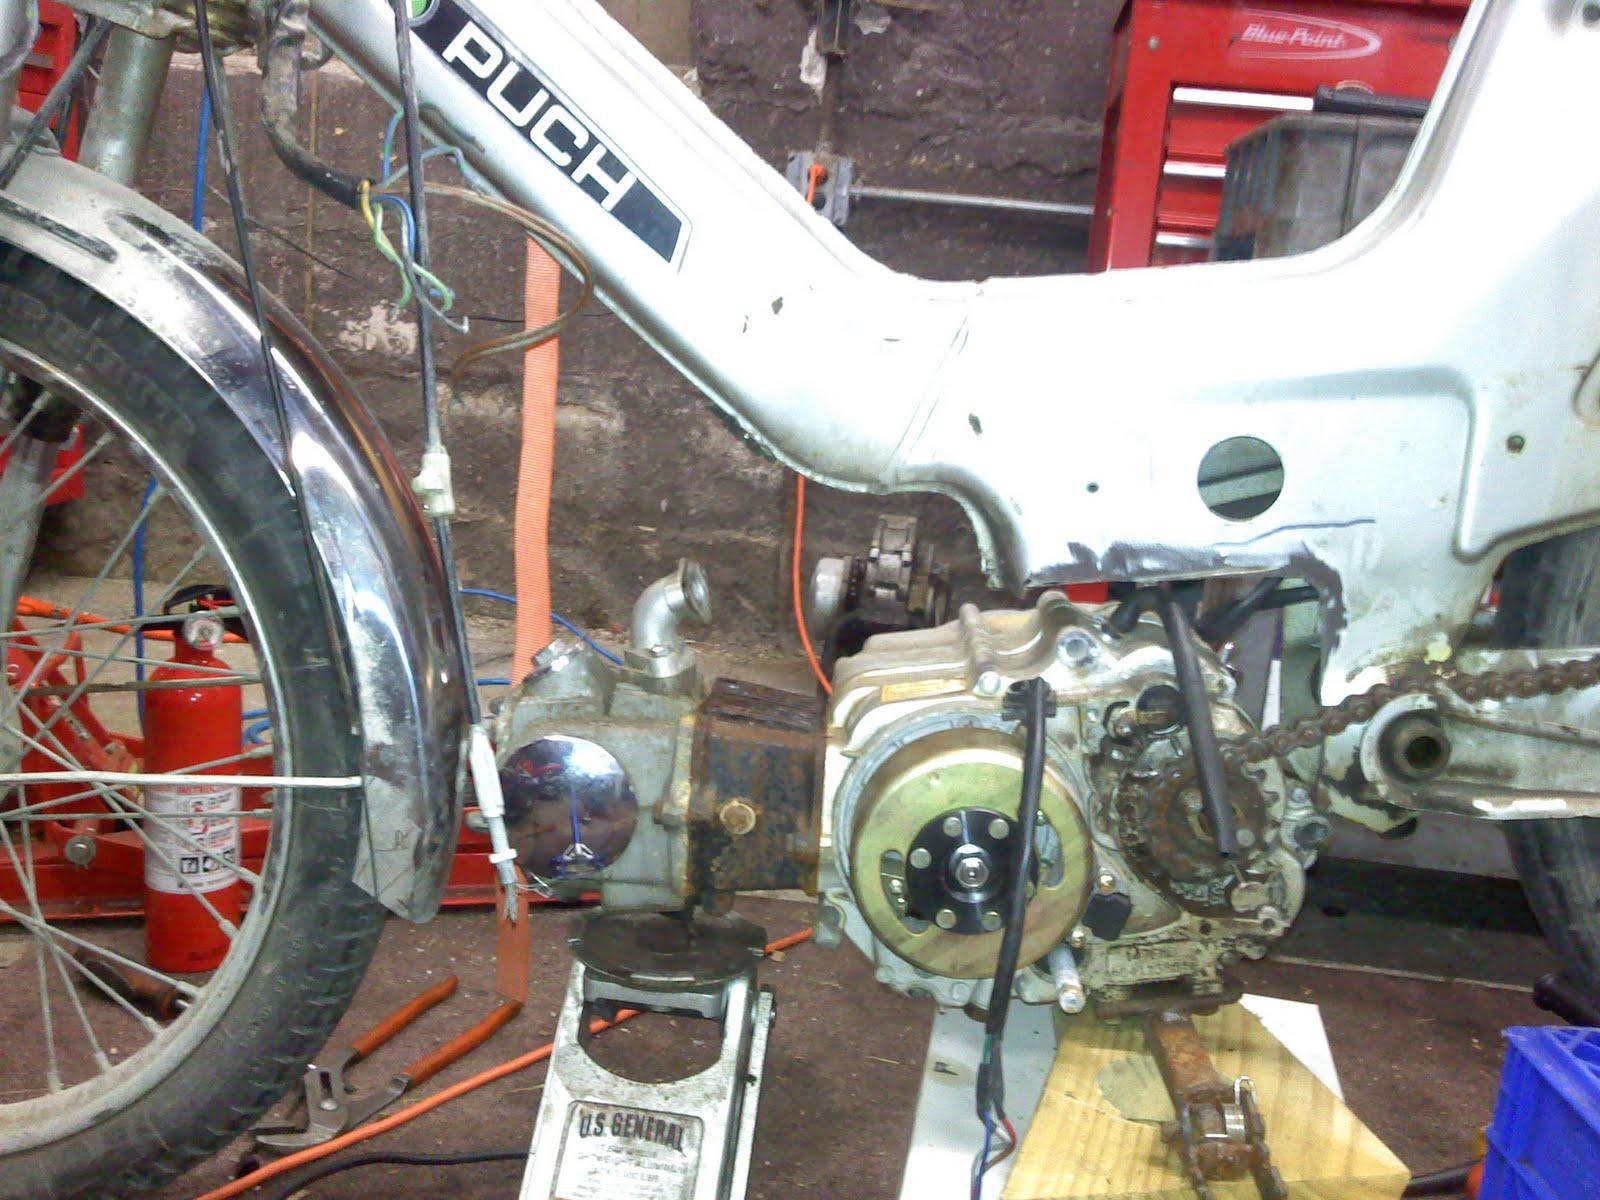 Don's garage: 1979 Puch Maxi CRF50 Engine Swap